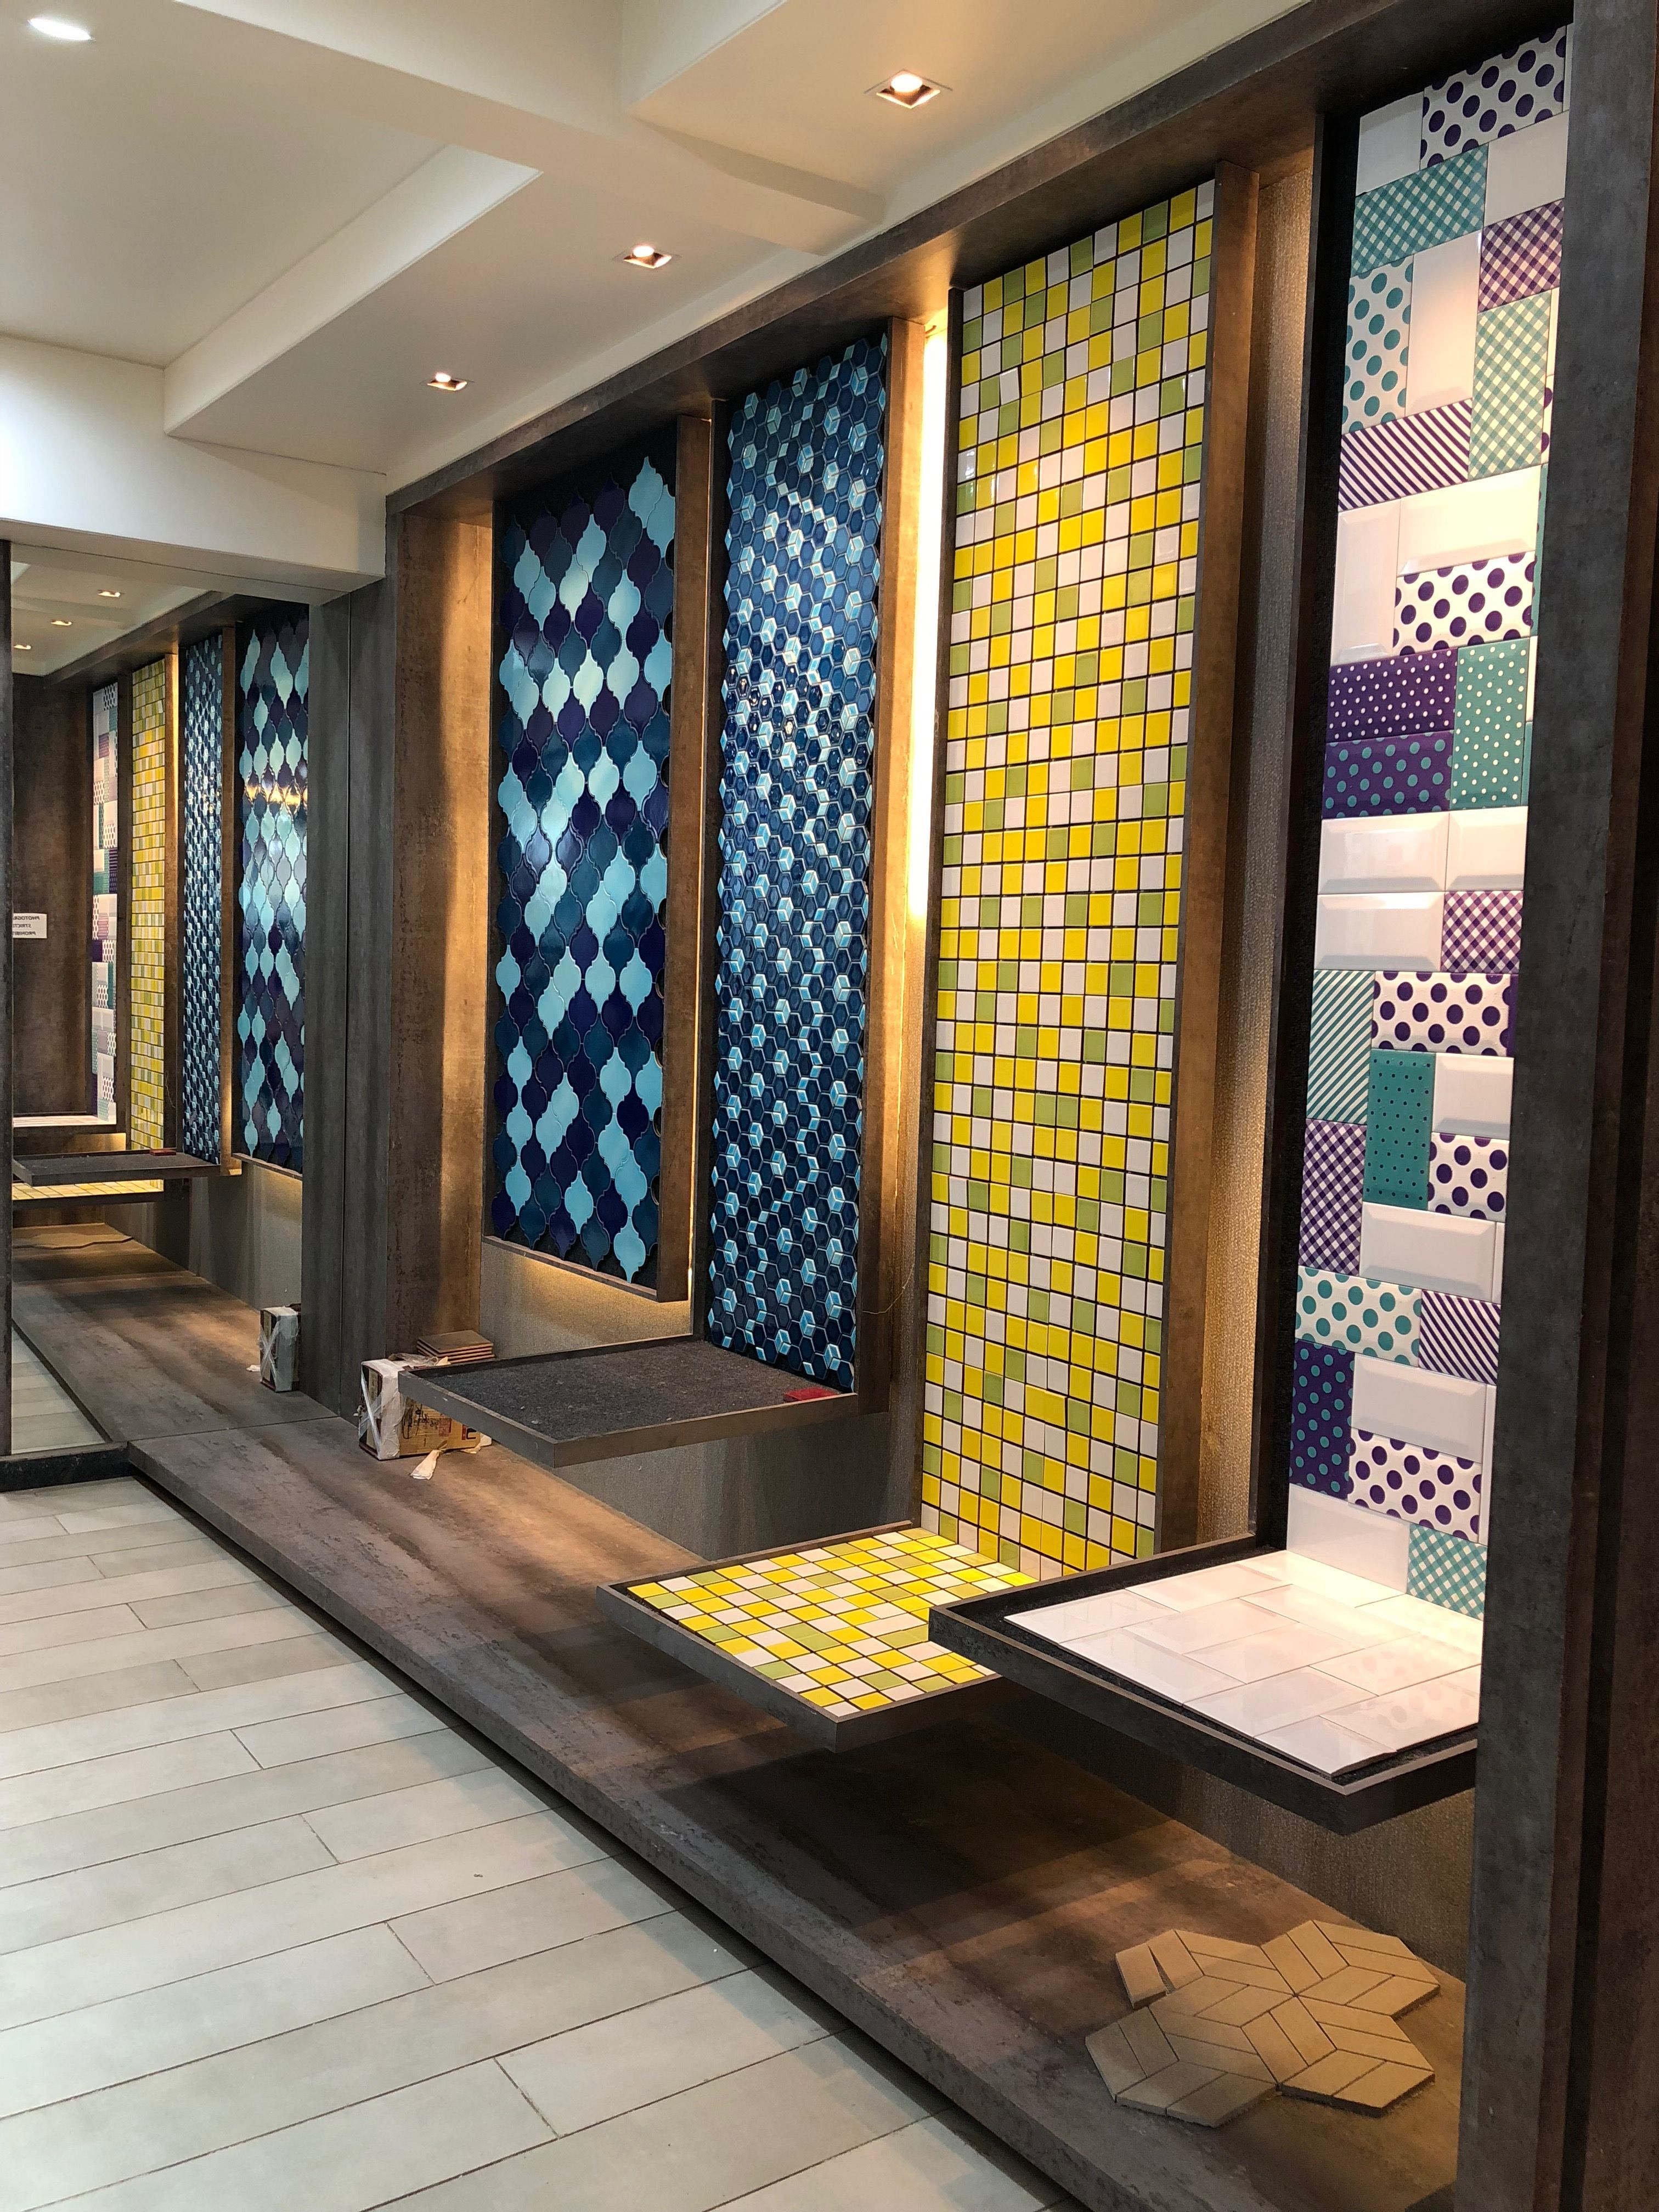 Mosaics Wall Display Panels Showrrom Tilesdisplay With Images